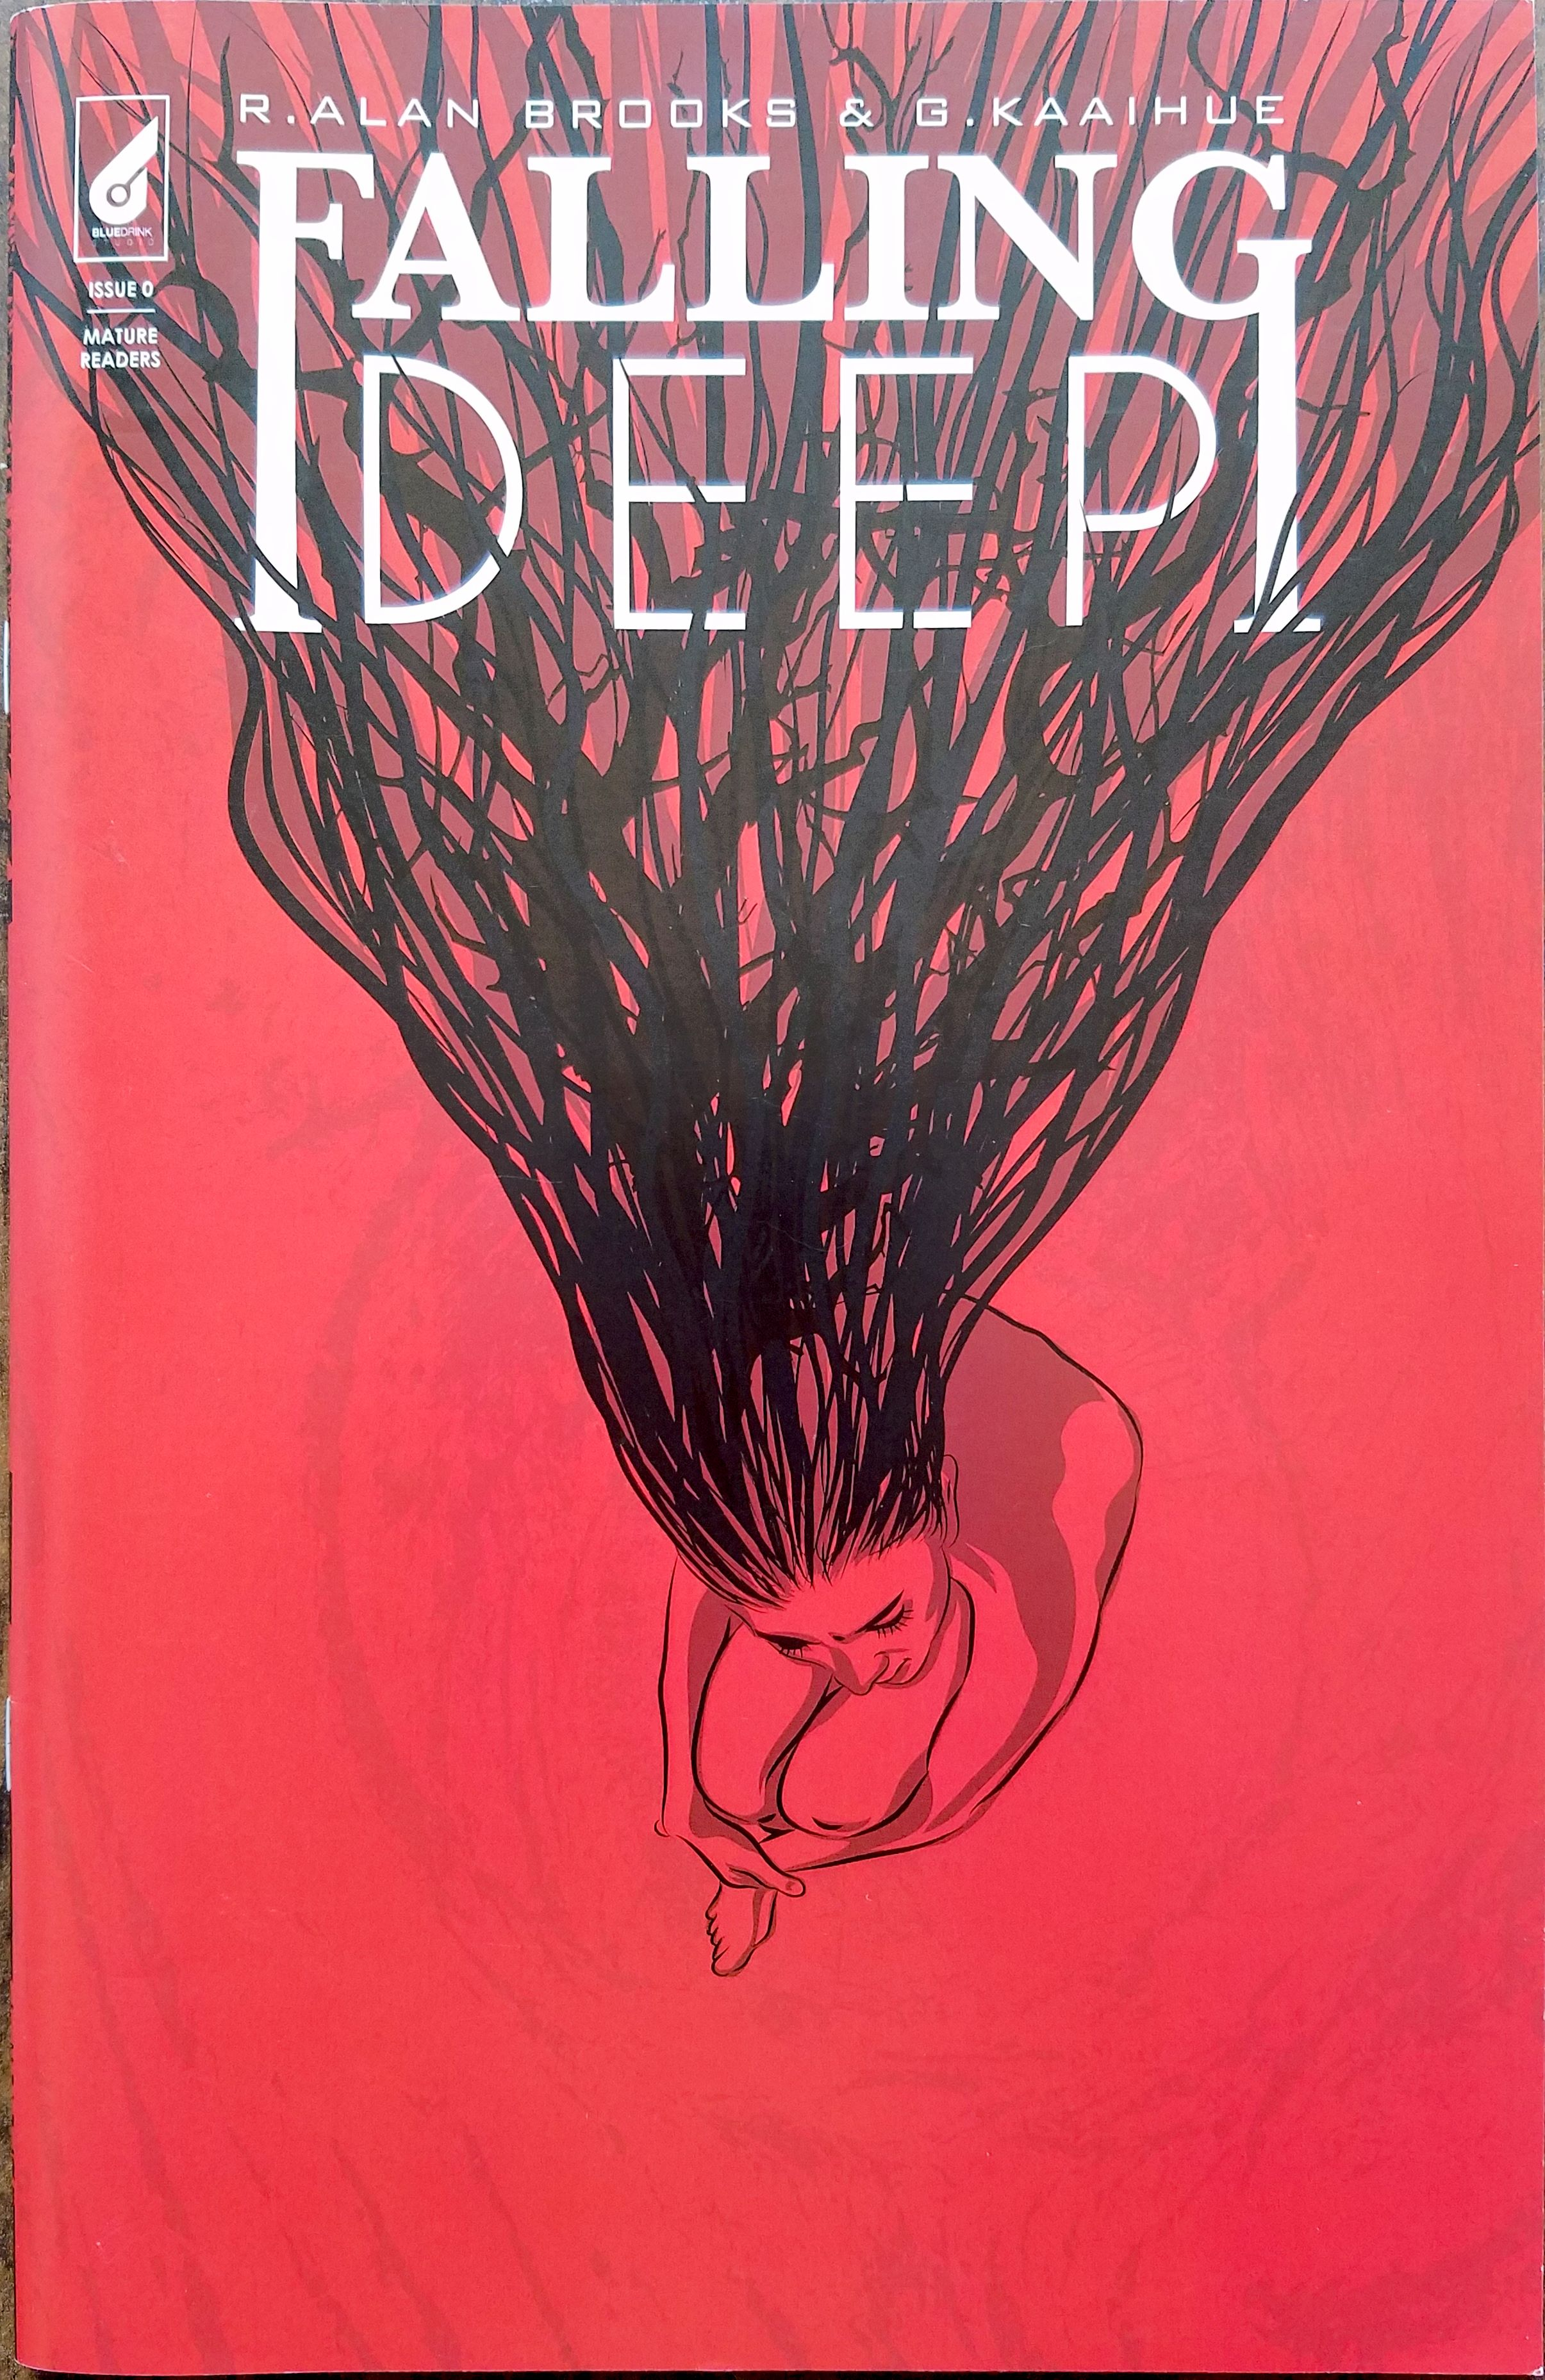 Falling Deep #1  - from  R. Alan Brooks  &  Gerhard Kaaihue .